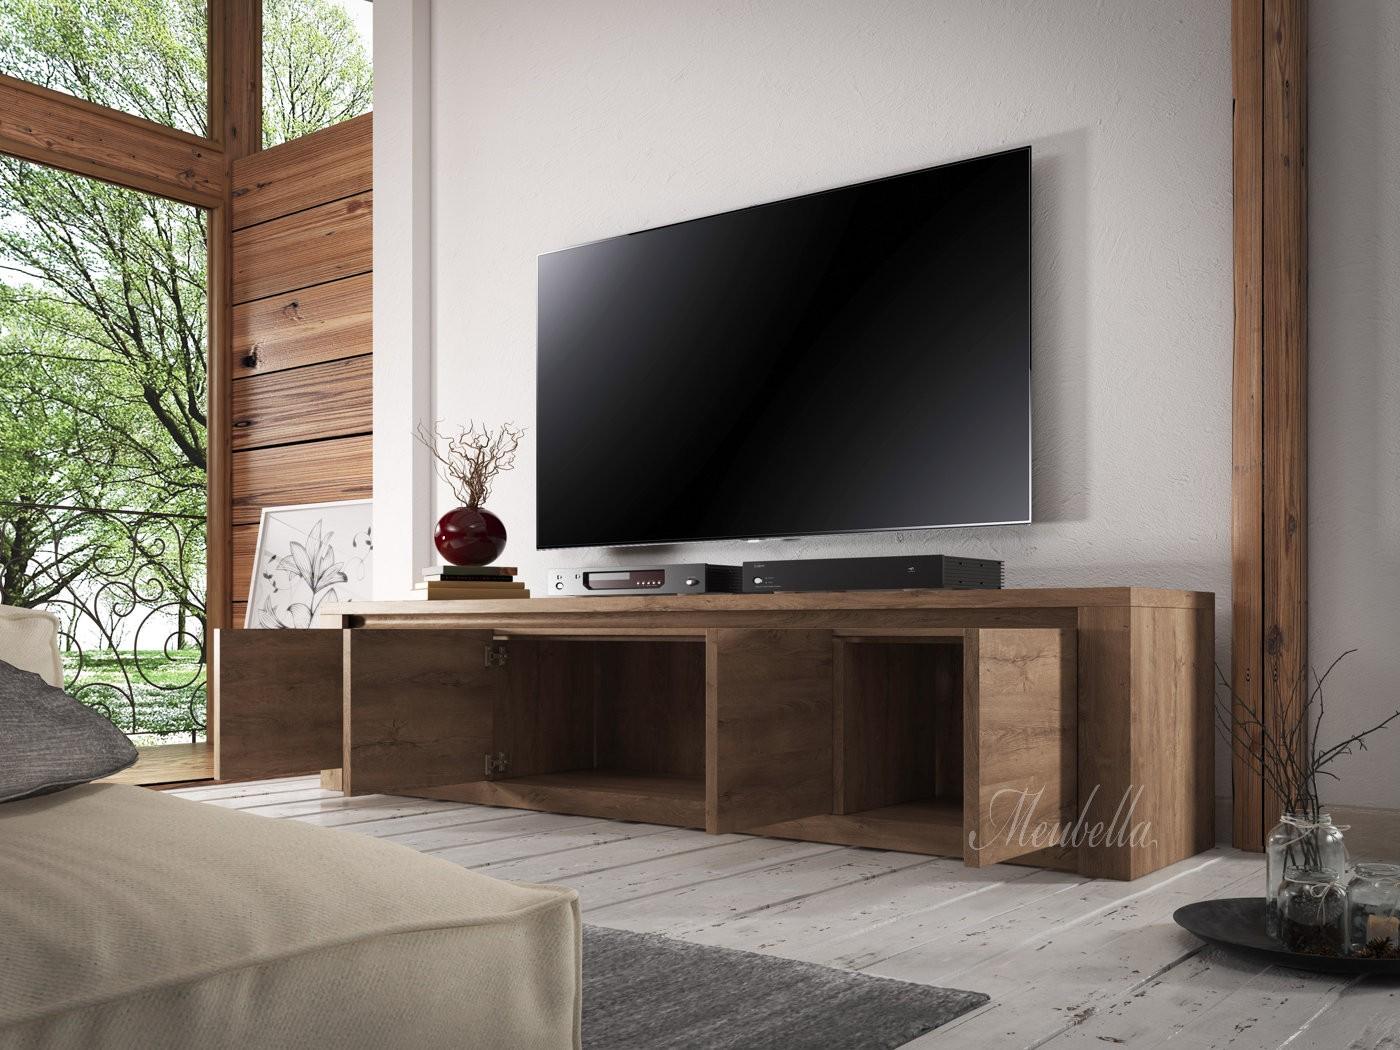 Tv meubel monaco eiken 4 deuren 170 cm meubella for Eiken tv meubel